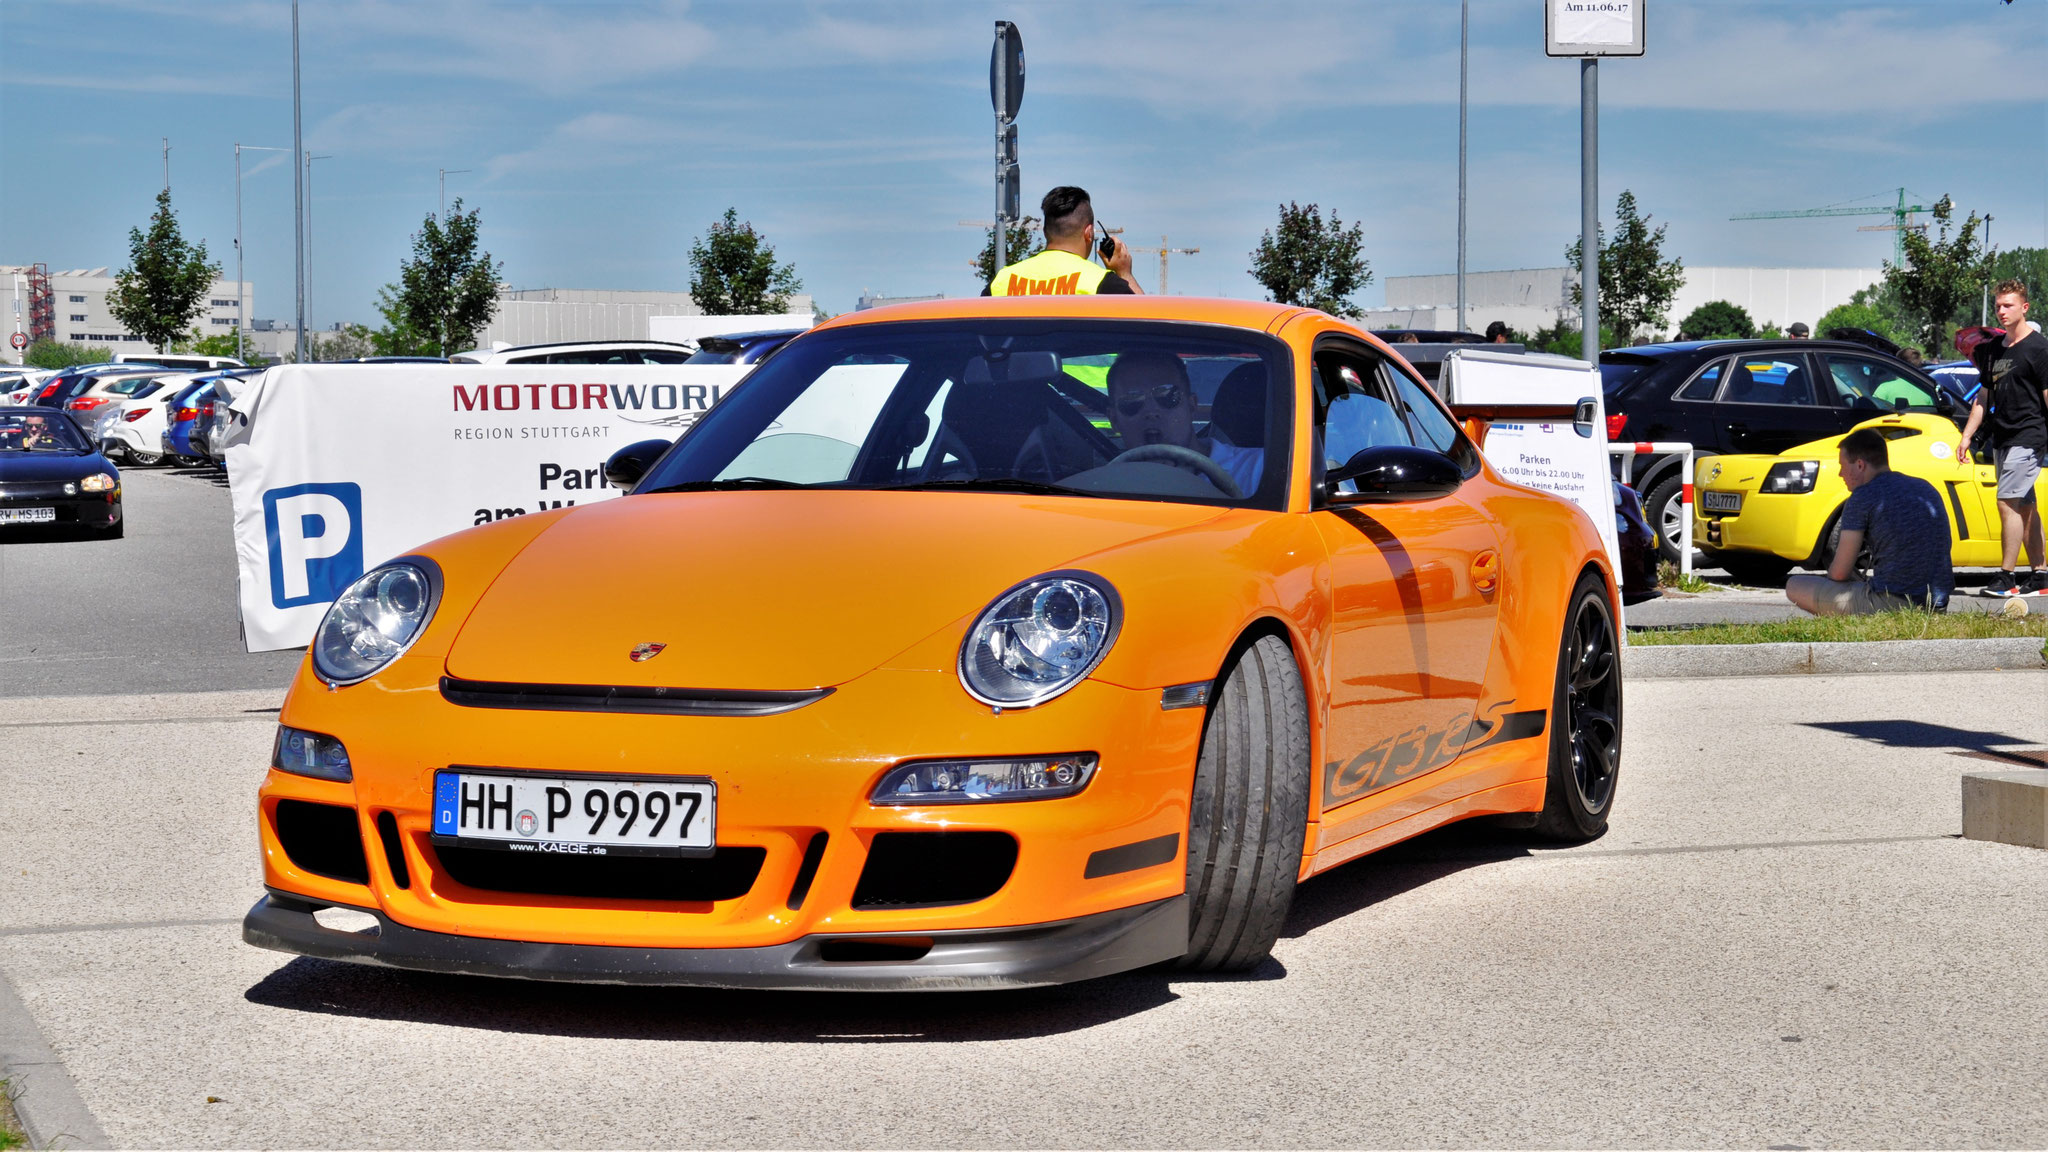 Porsche 911 GT3 RS - HH-P-9997